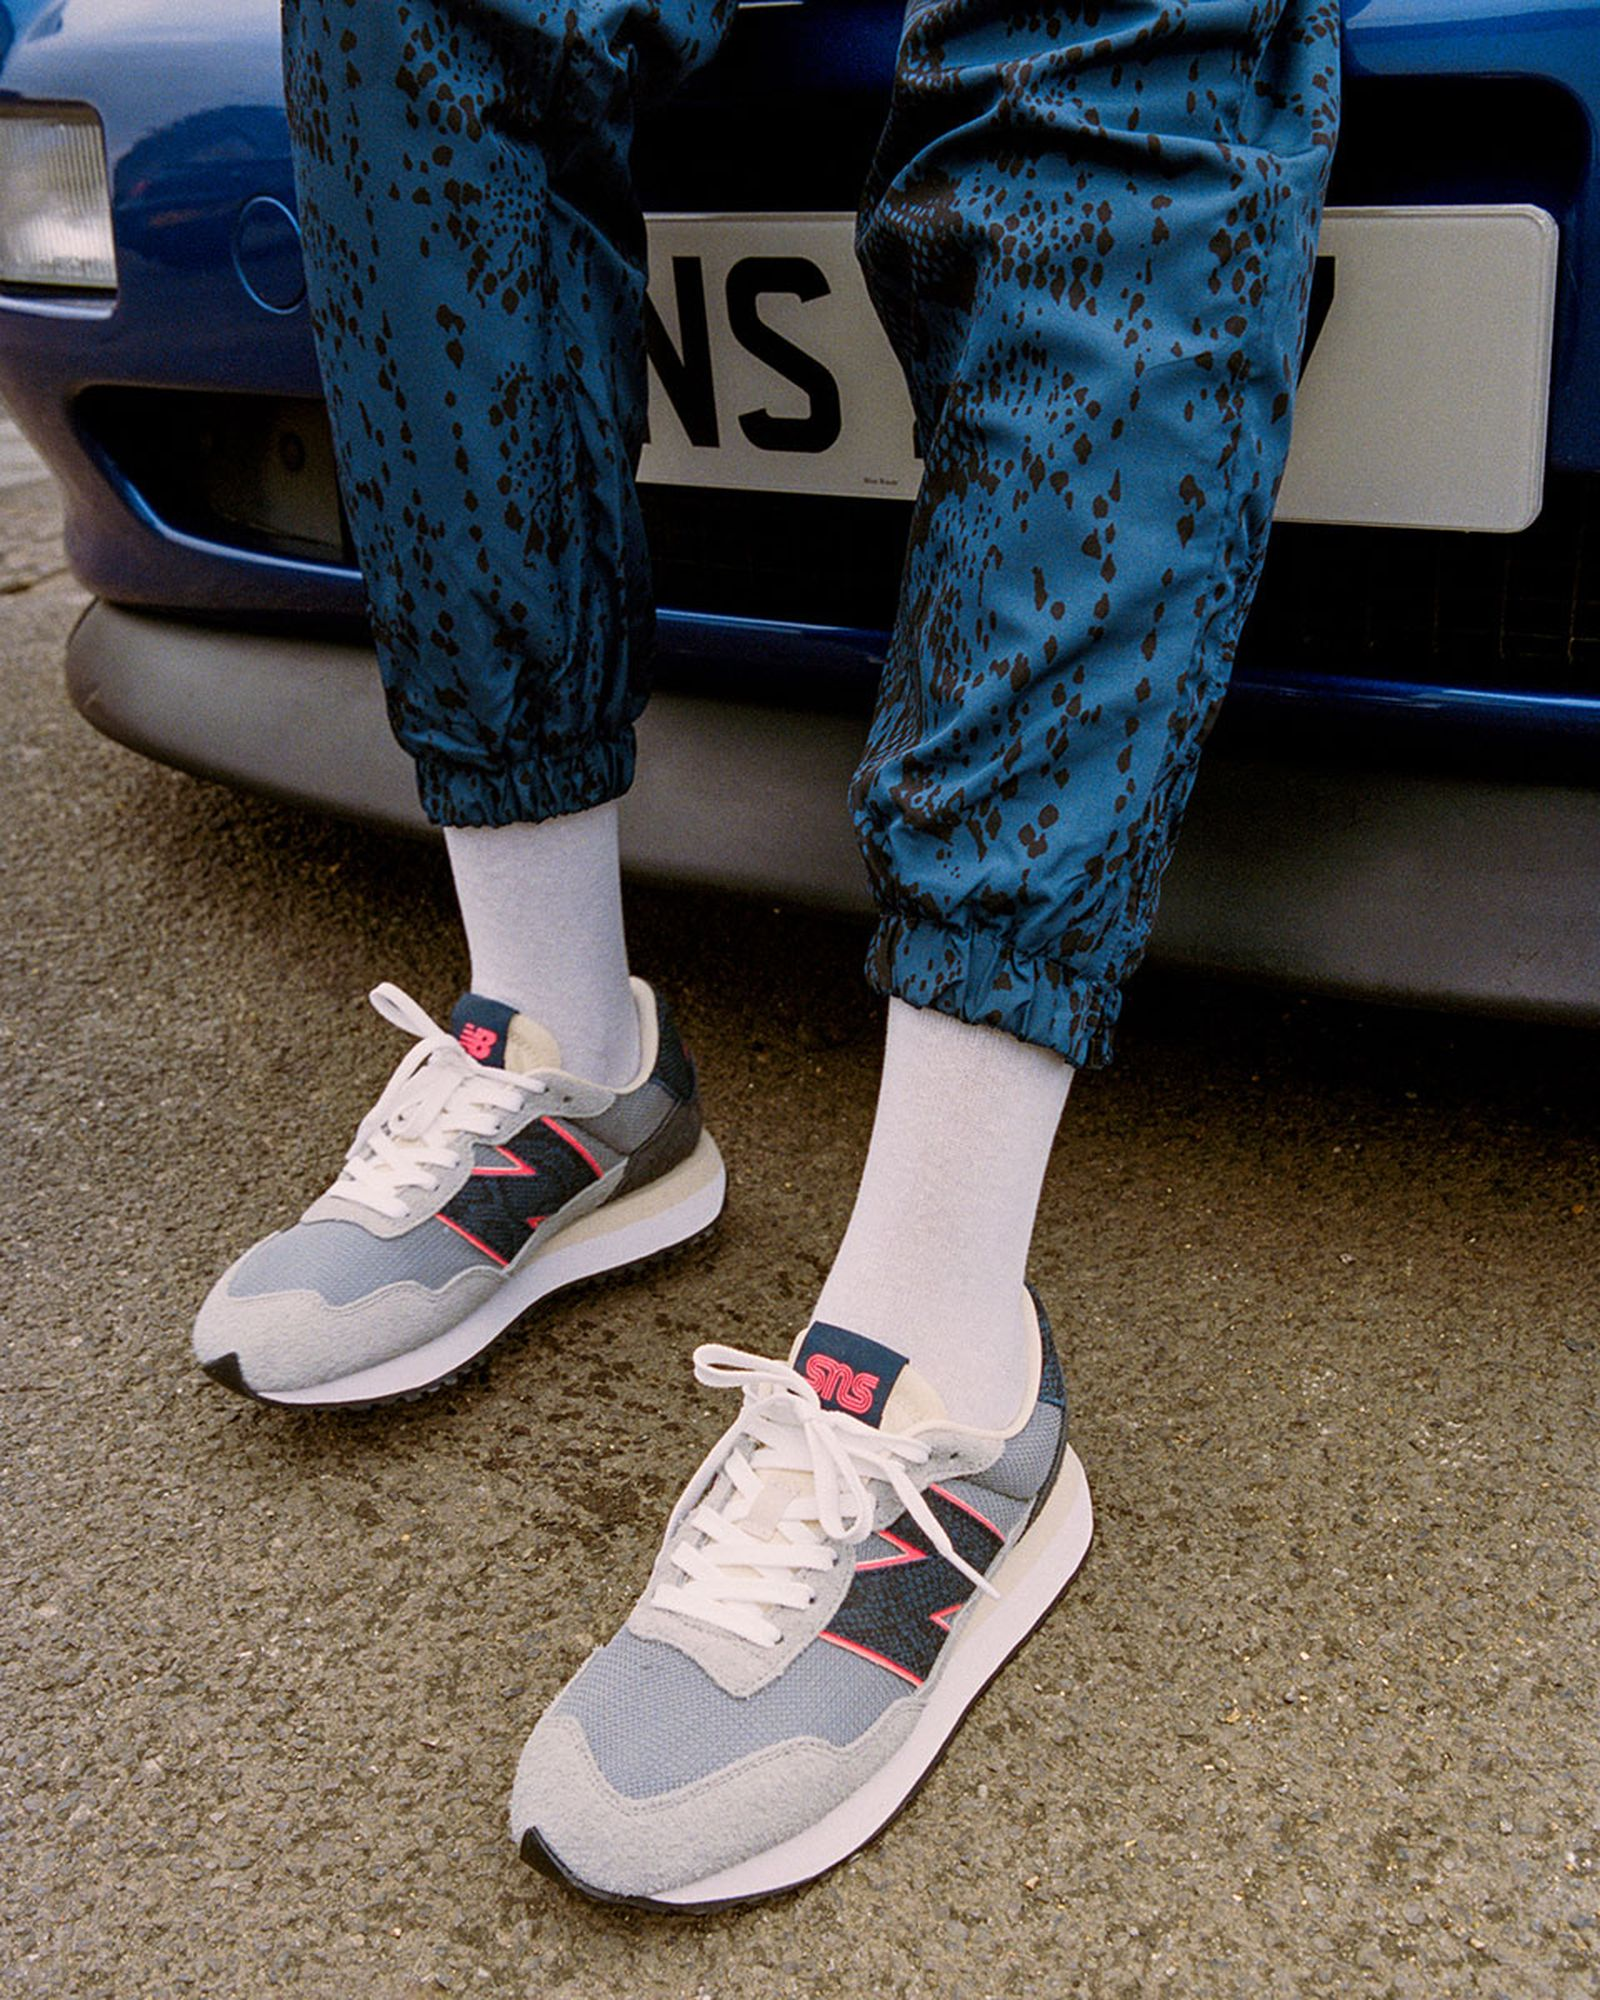 sneakersnstuff-new-balance-237-release-date-price-03